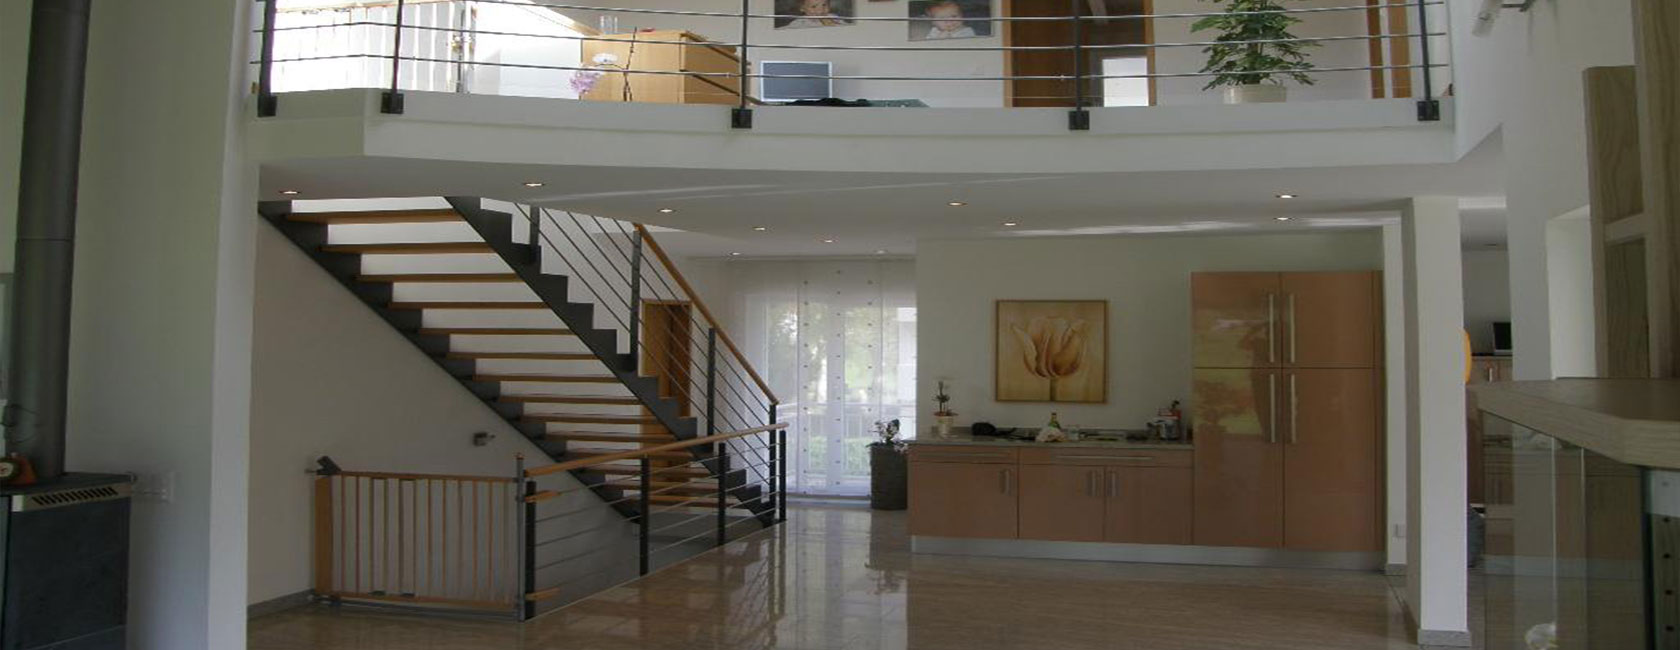 produkte metallprofi ren in albon ag. Black Bedroom Furniture Sets. Home Design Ideas